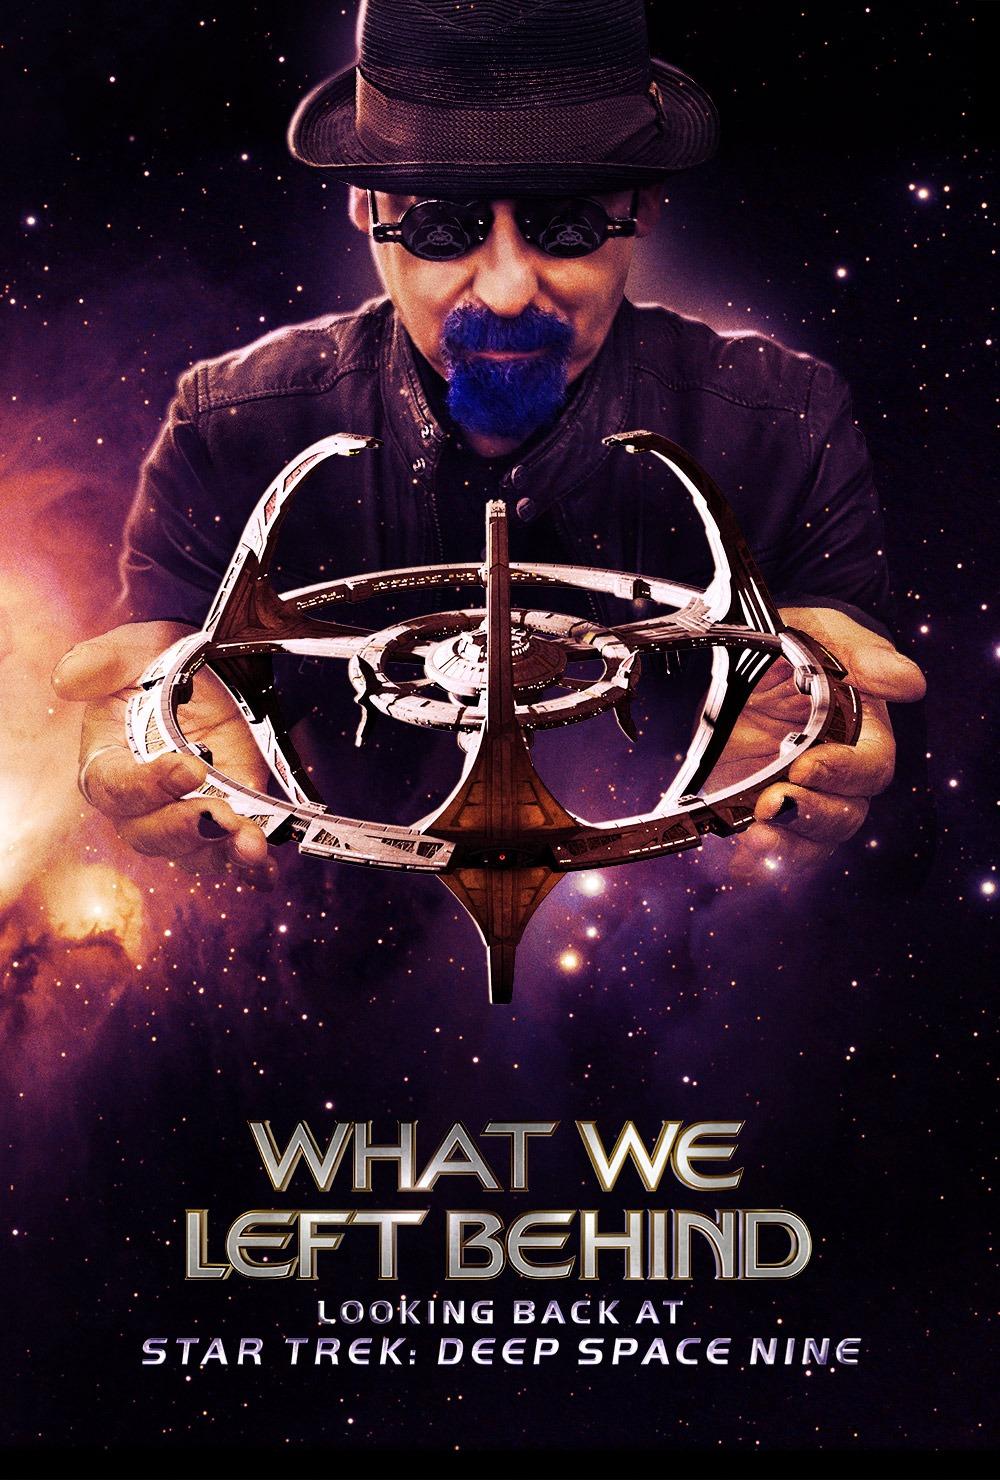 What We Left Behind: Looking Back at Star Trek Deep Space Nine - May 13th, 2019